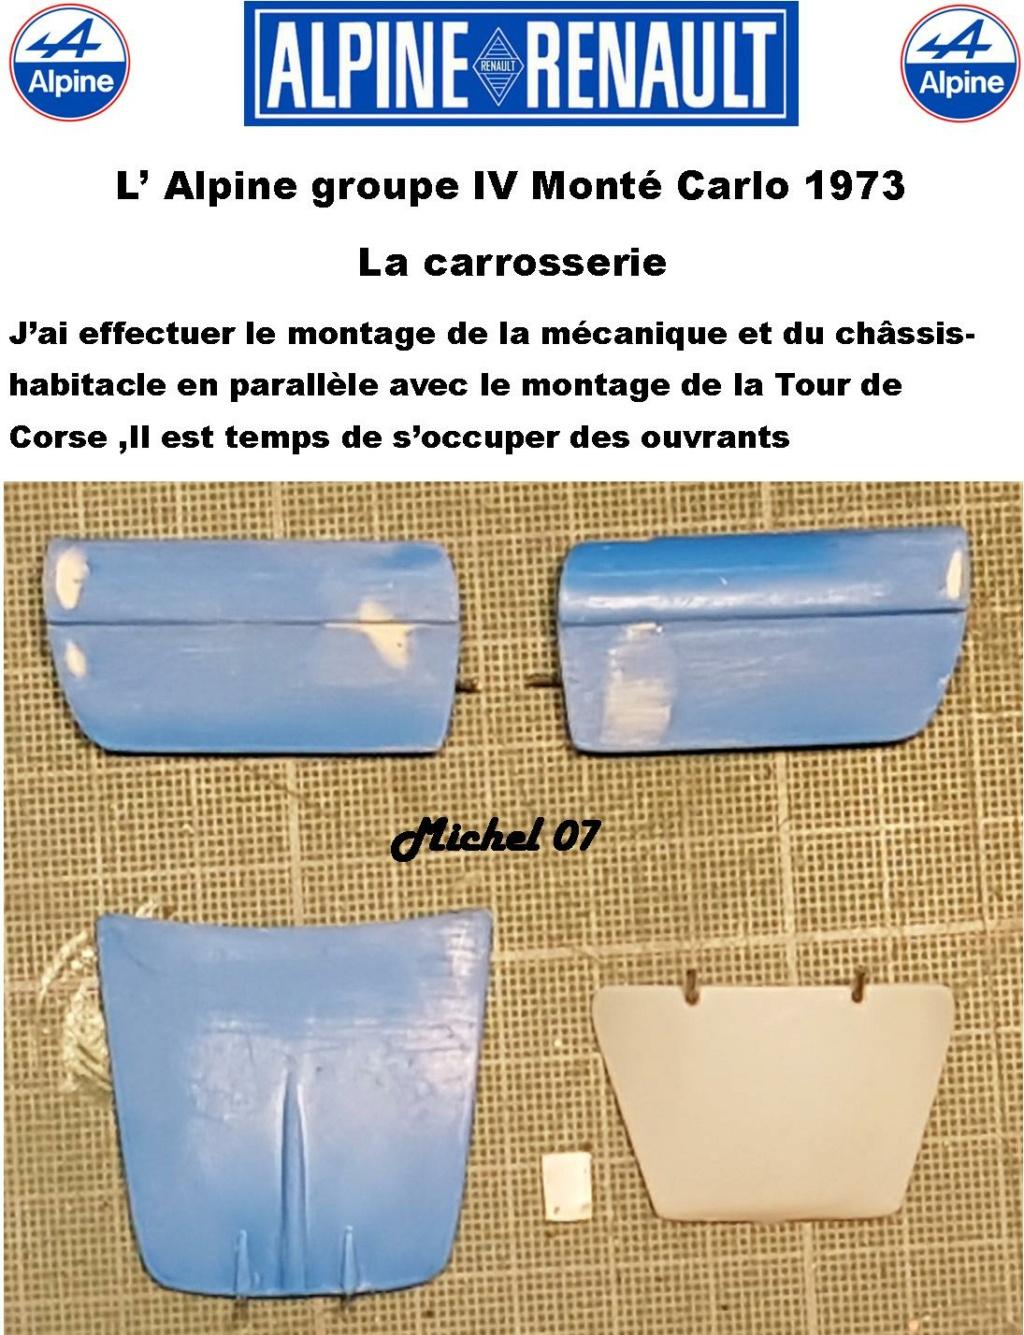 Fil rouge 2021 * Alpine A110 Groupe IV Monté Carlo 1973 1/24 Heller 80745 diorama assistance 25_210